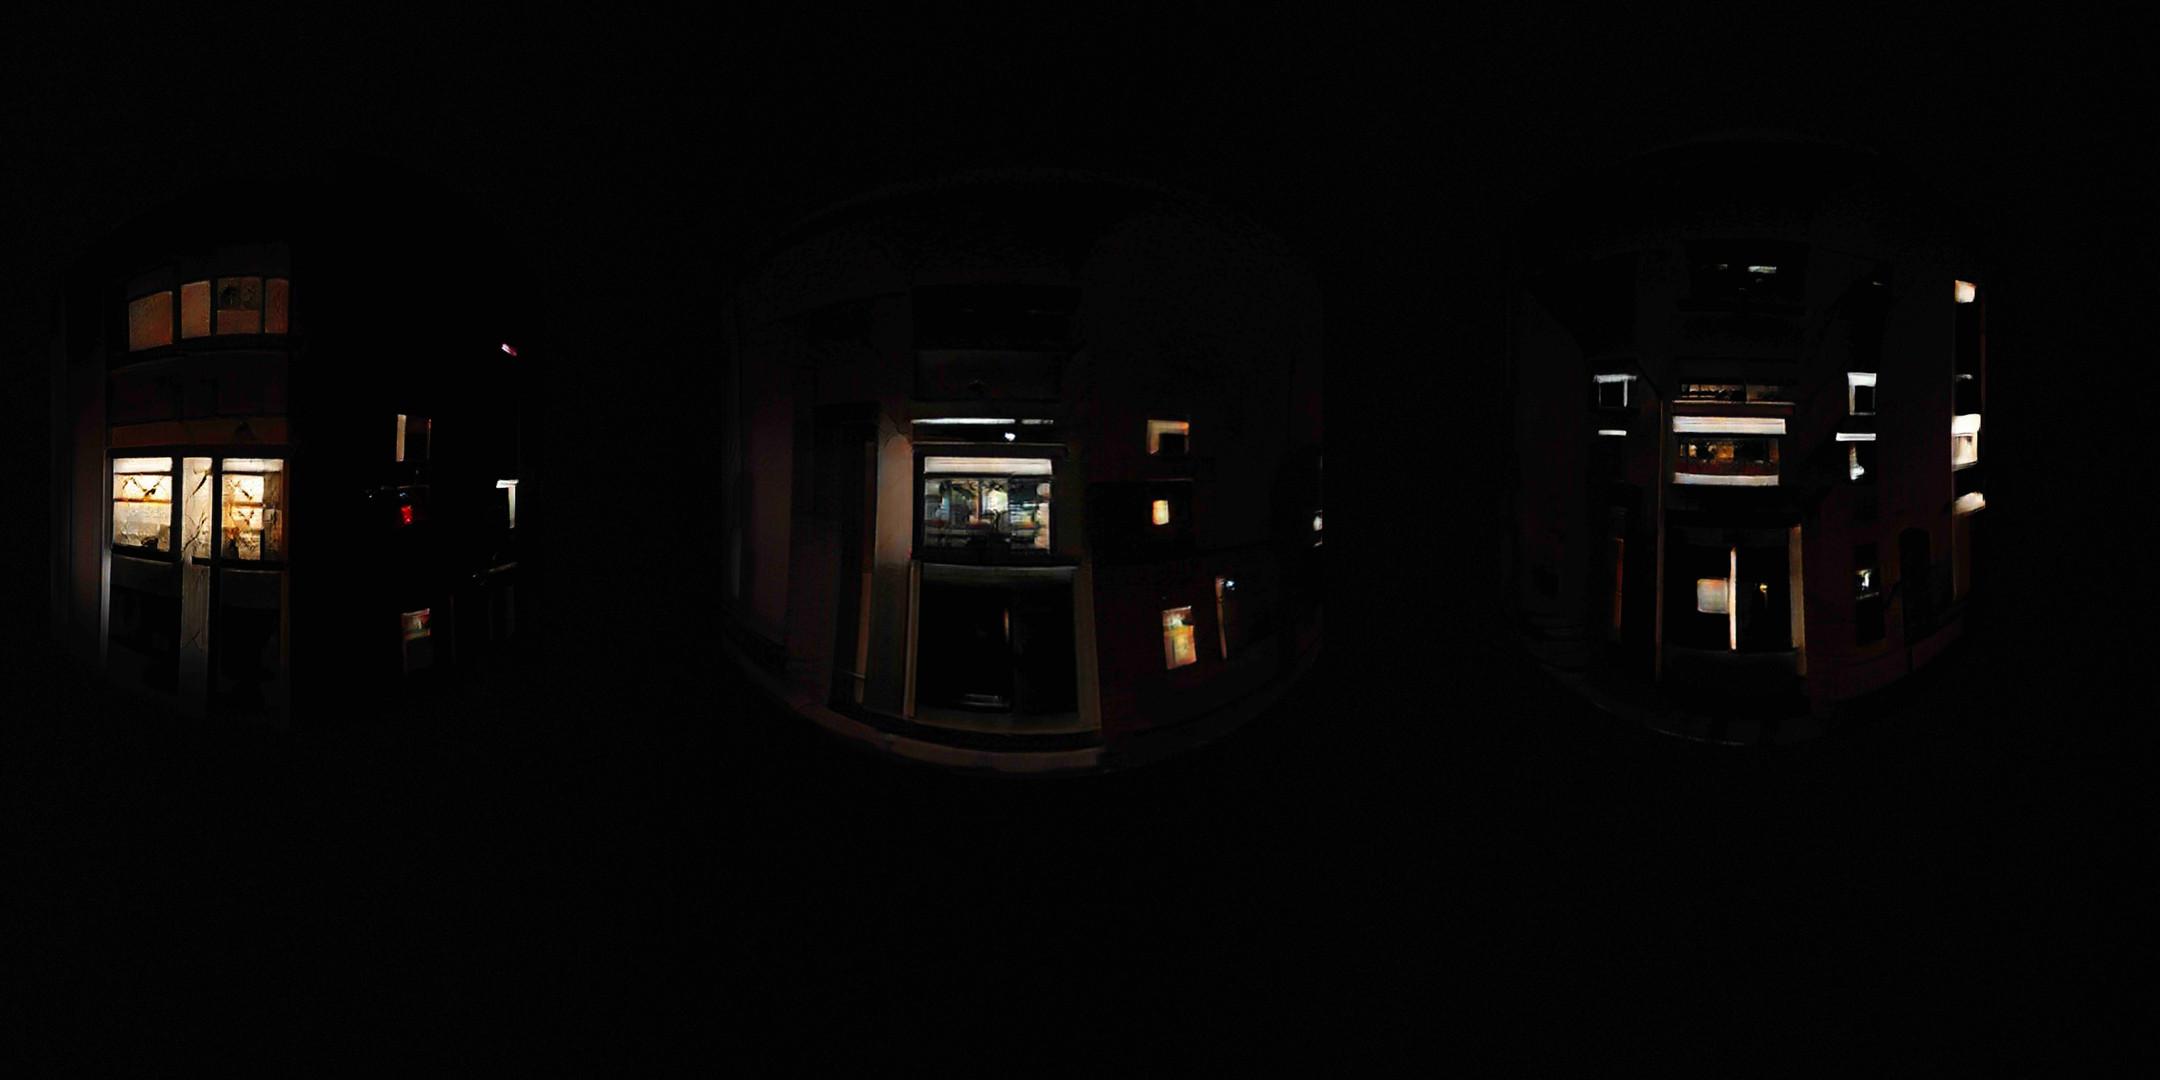 nightscene2.jpg